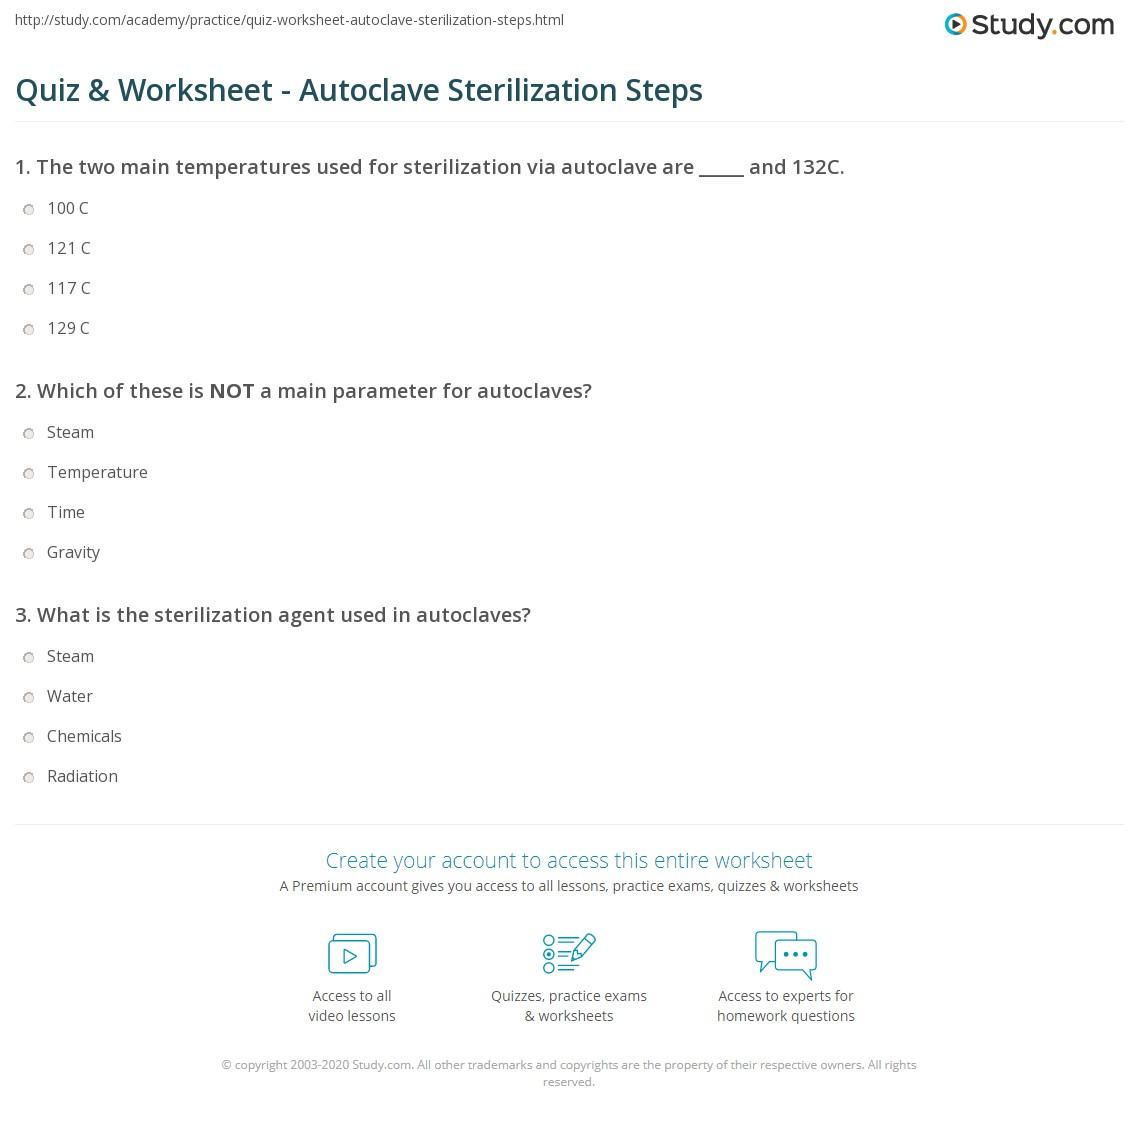 Quiz & Worksheet - Autoclave Sterilization Steps | Study com